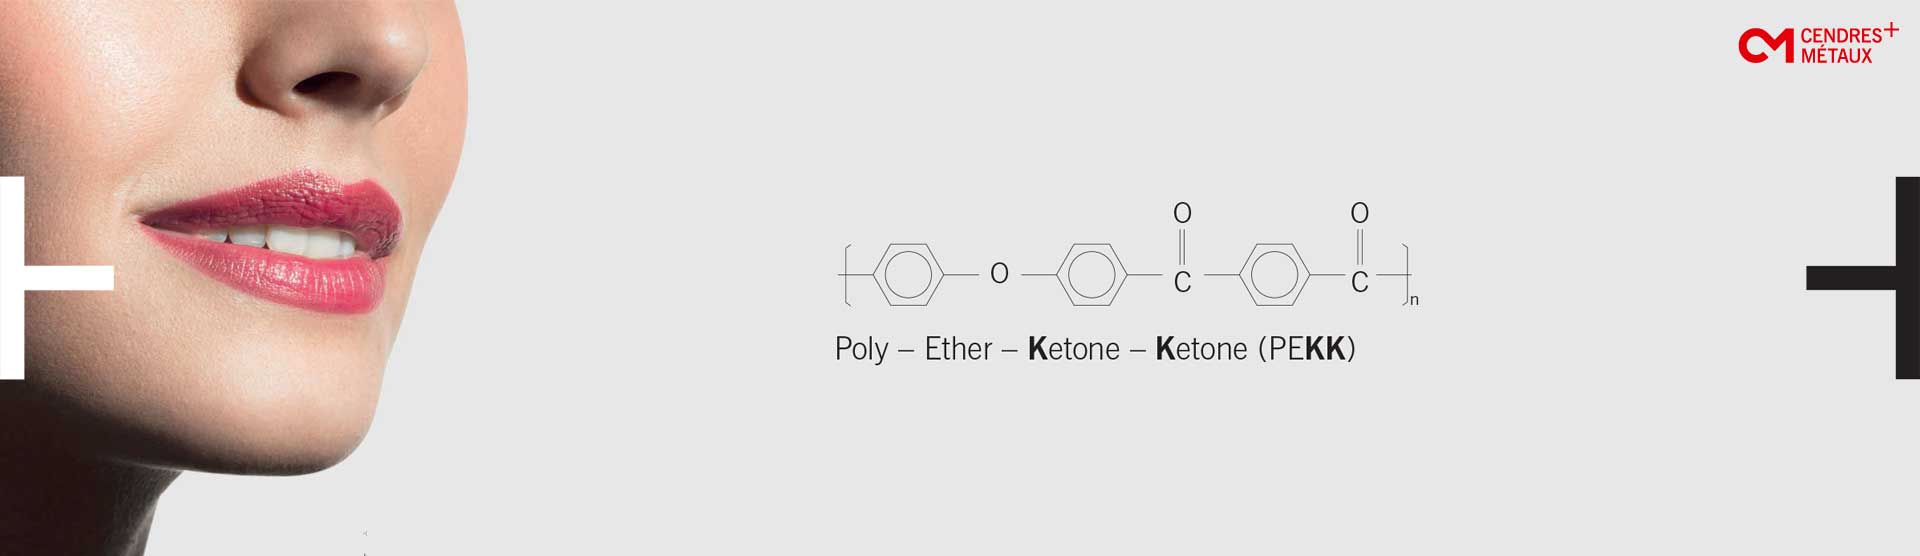 Zadnja generacija polimerov - Pekkton® ivory!